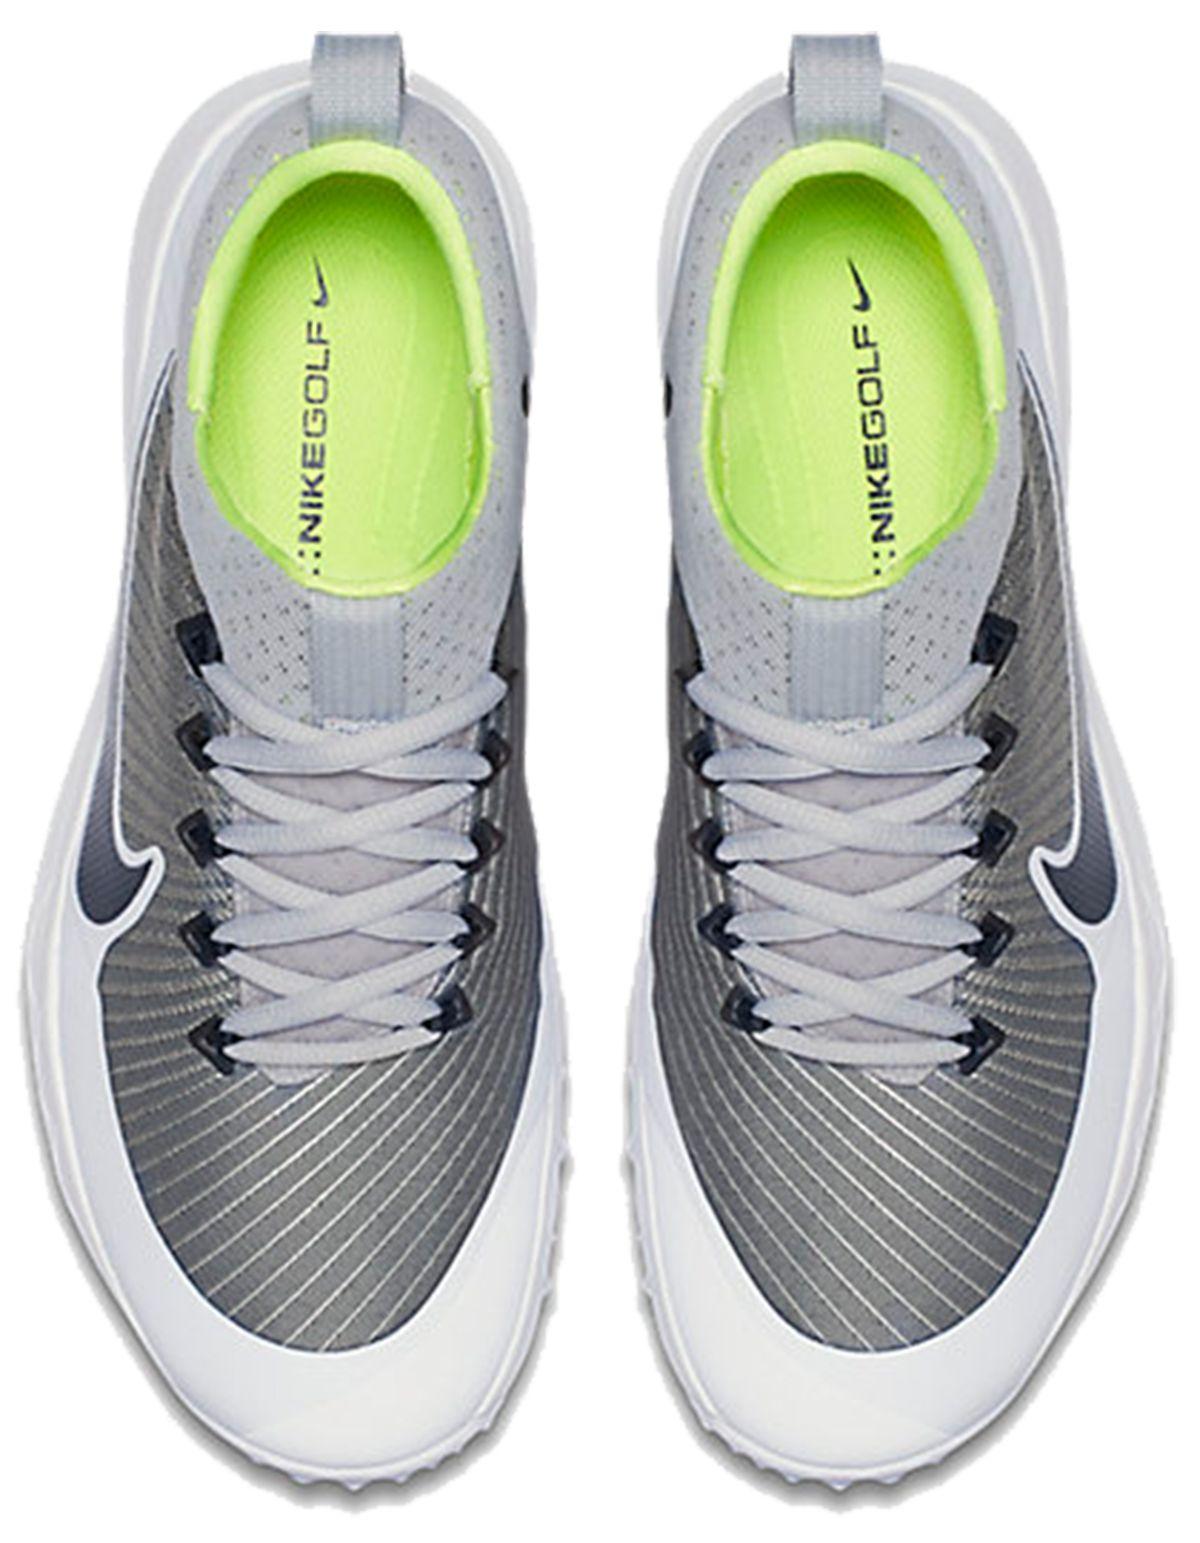 Nike Women's FI Premiere Golf Shoes